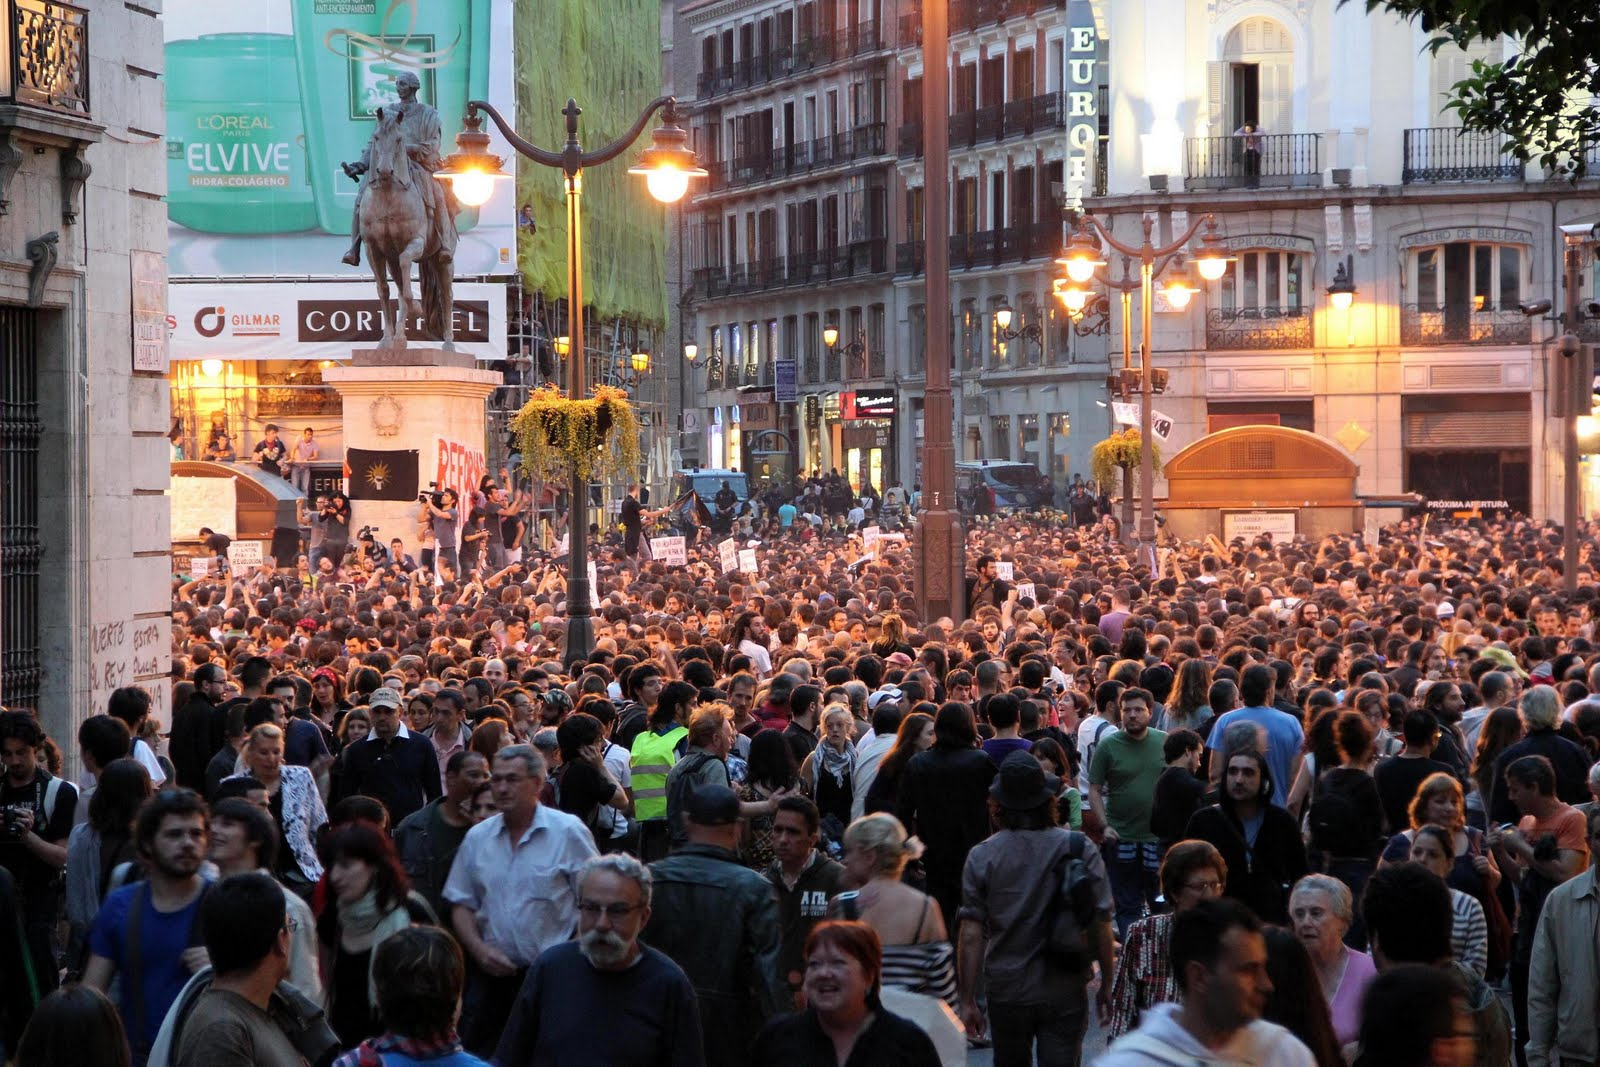 Der Angriff der Jugend verursacht erste Risse im Erbregime der Franco-Diktatur